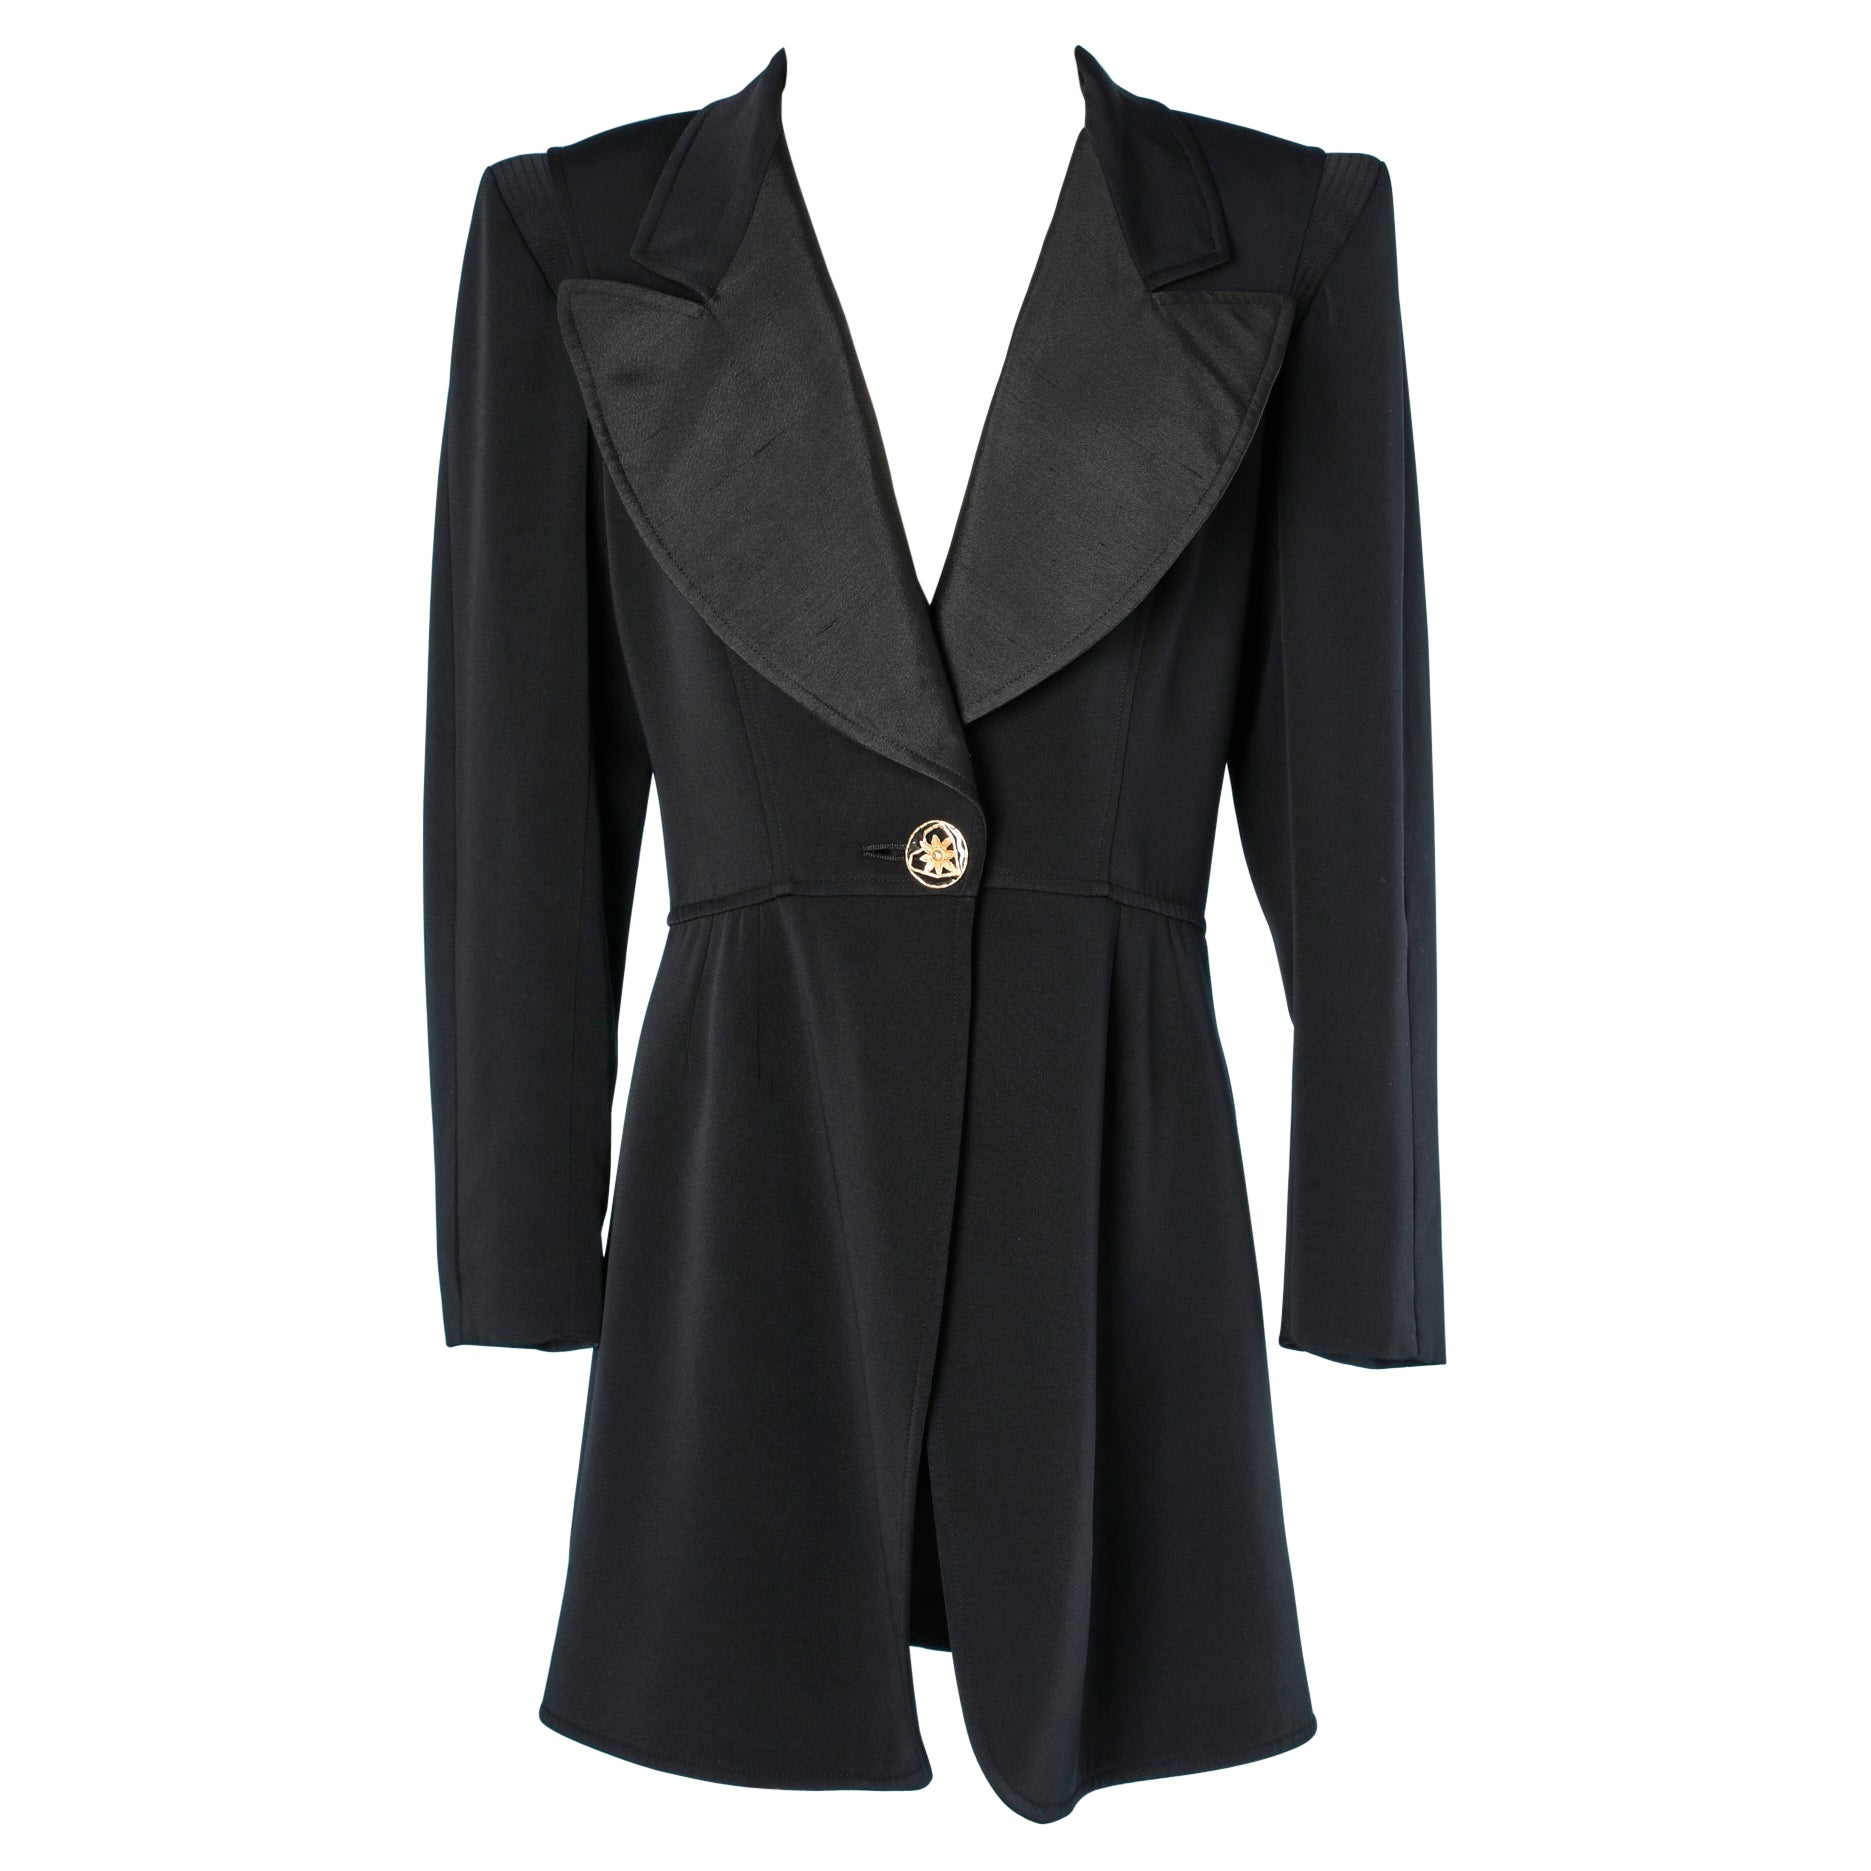 Black blazer with gold metal button Christian Lacroix